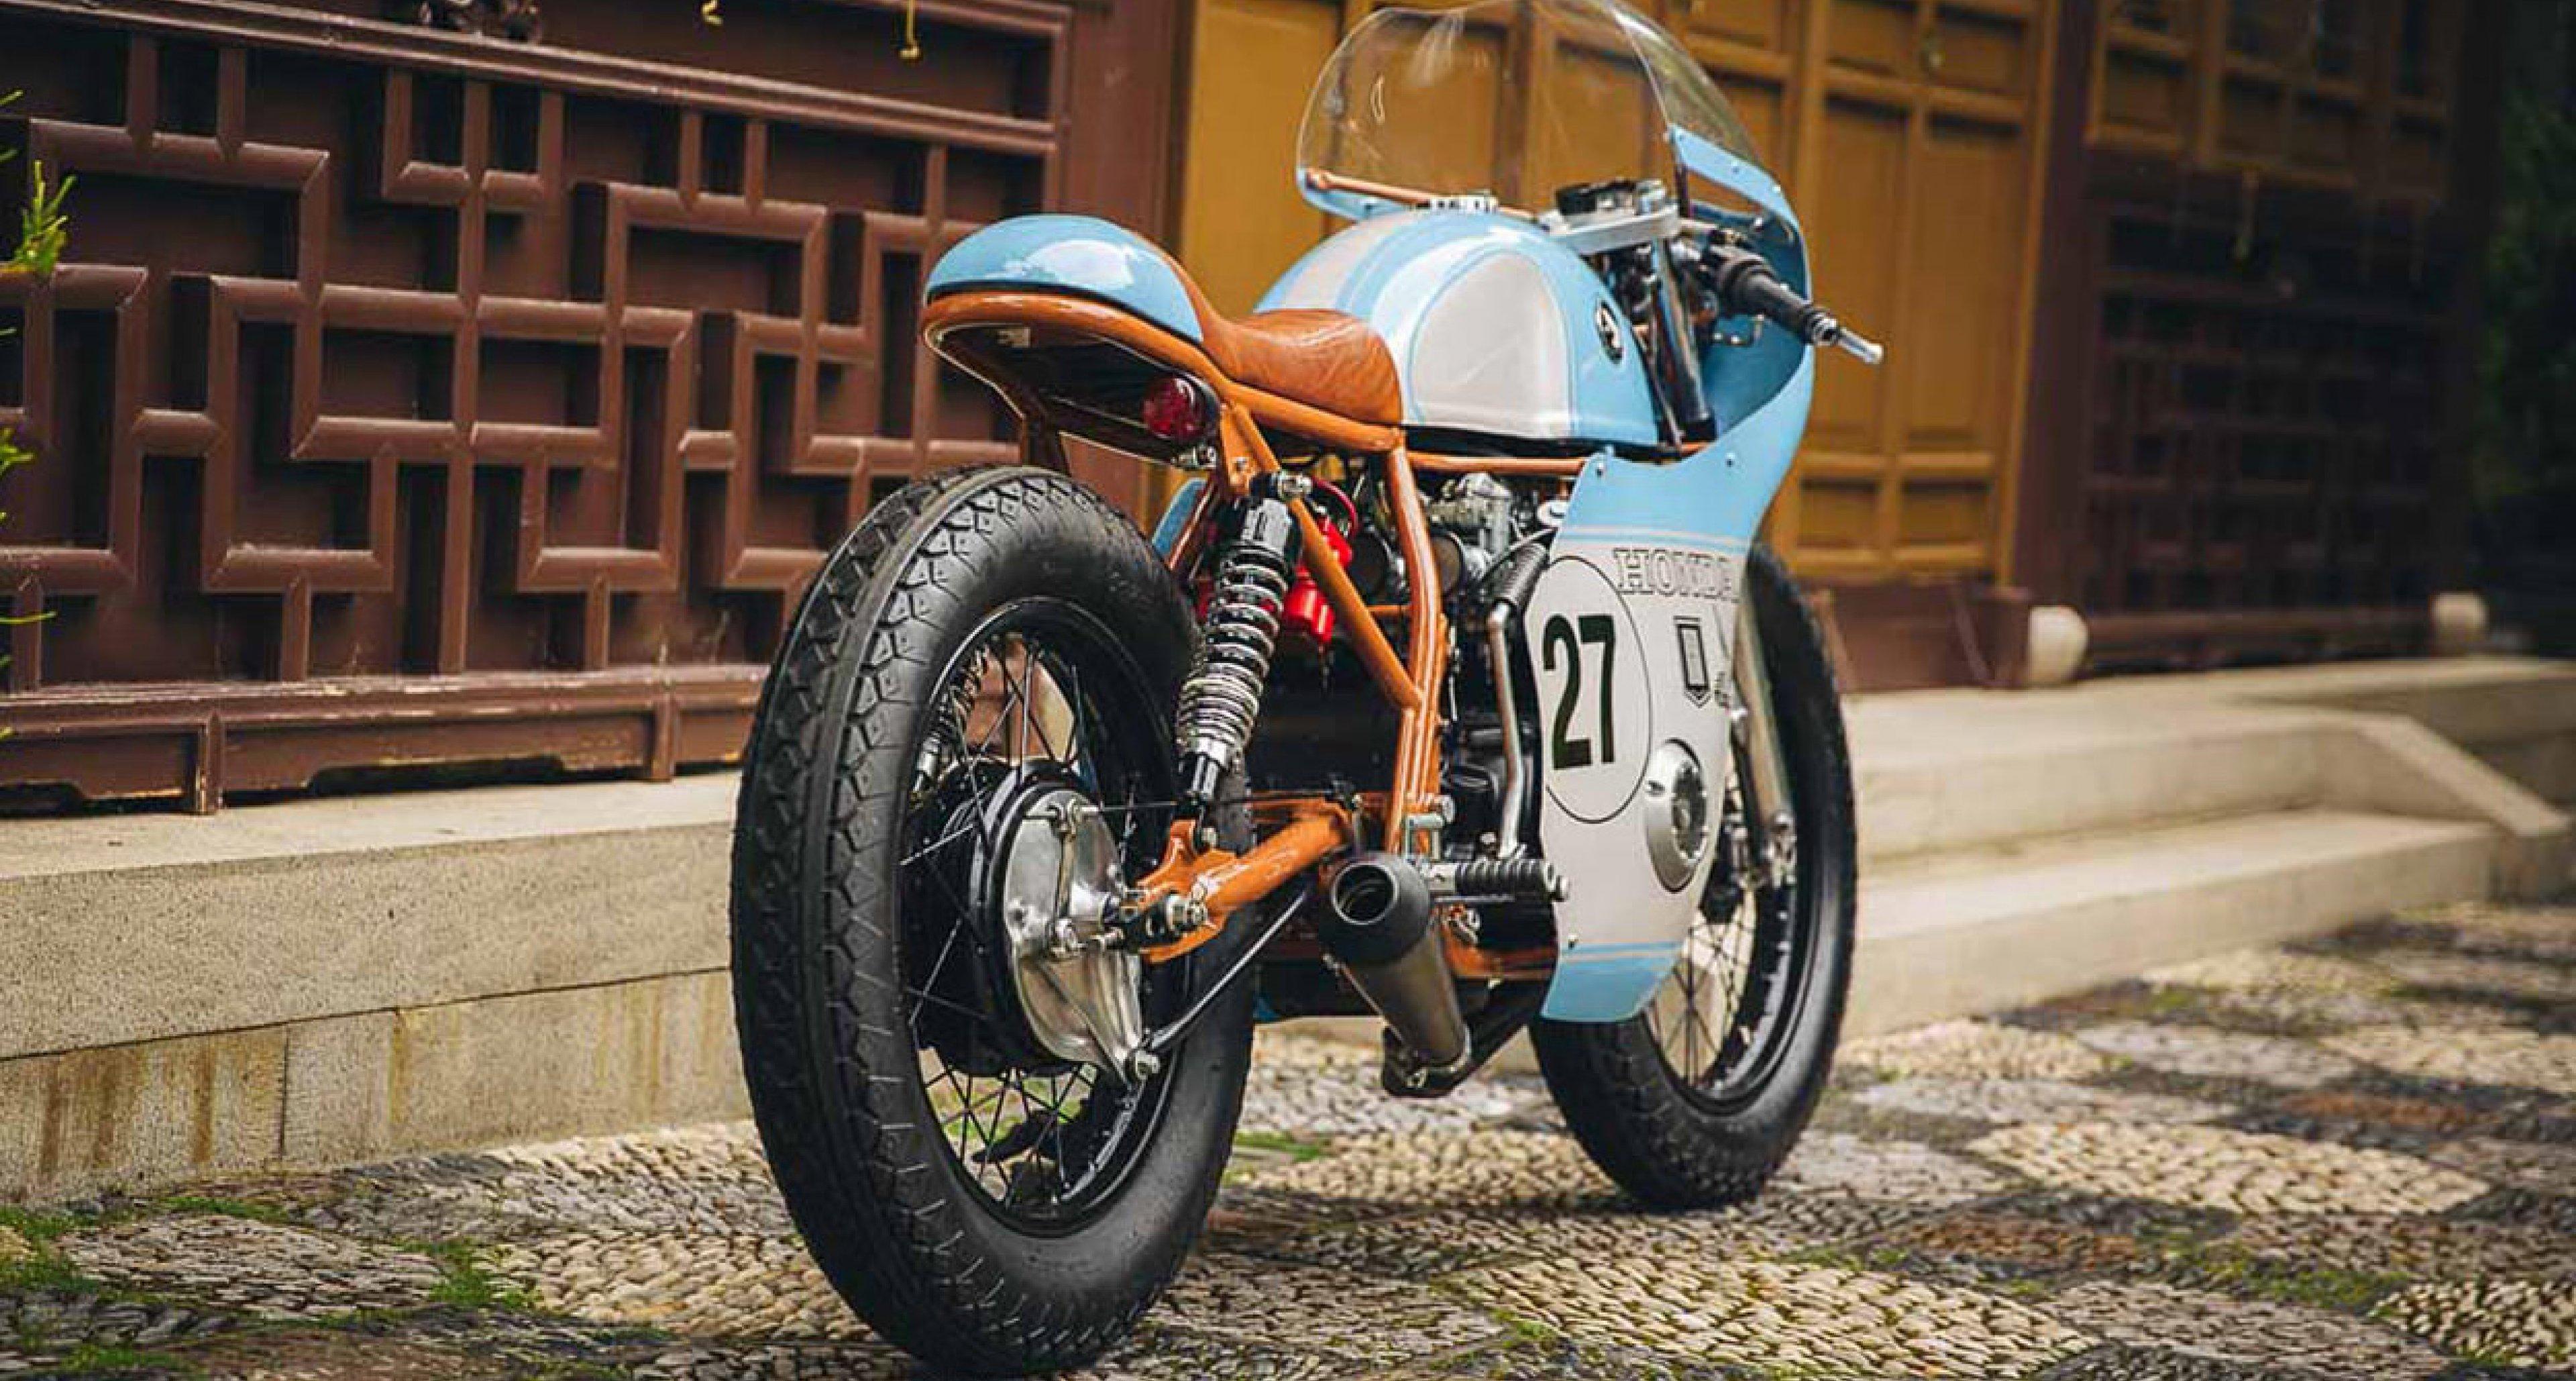 Have you seen a prettier café racer than this racy Honda CB550? | Classic Driver Magazine